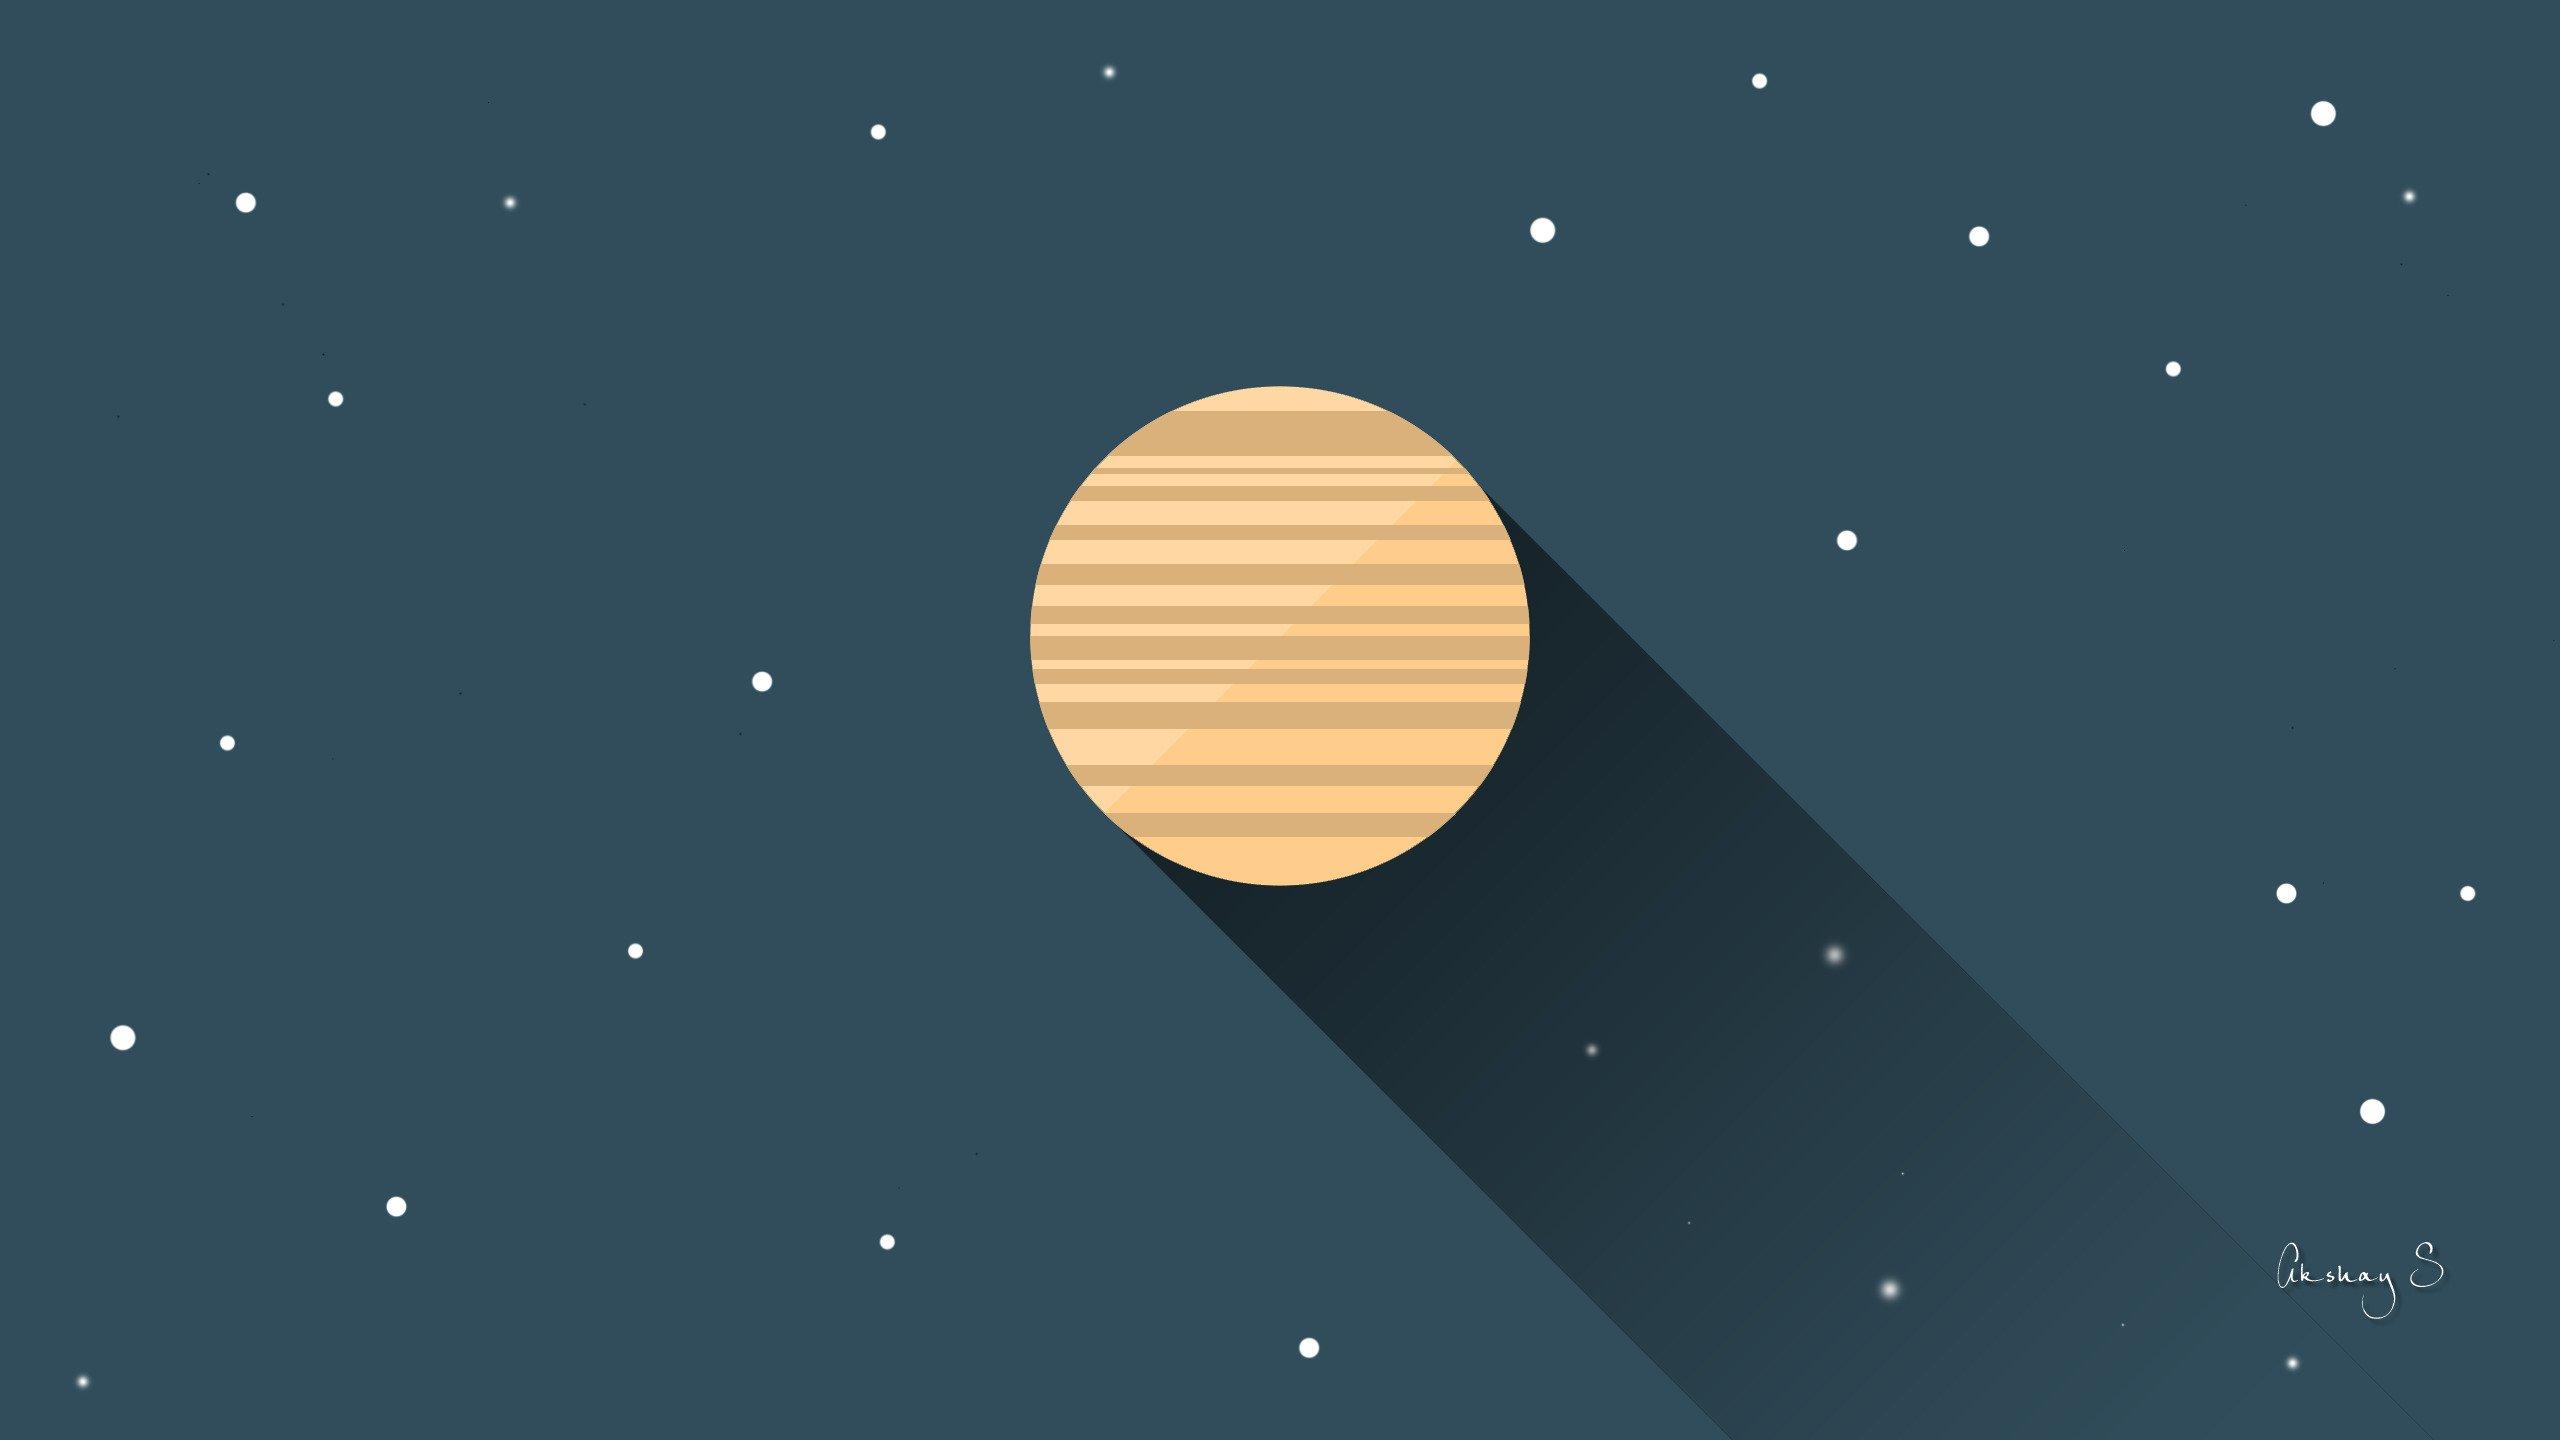 Hd Material Design Wallpapers Planet Flatdesign Digital Art Minimalism Space Art Hd